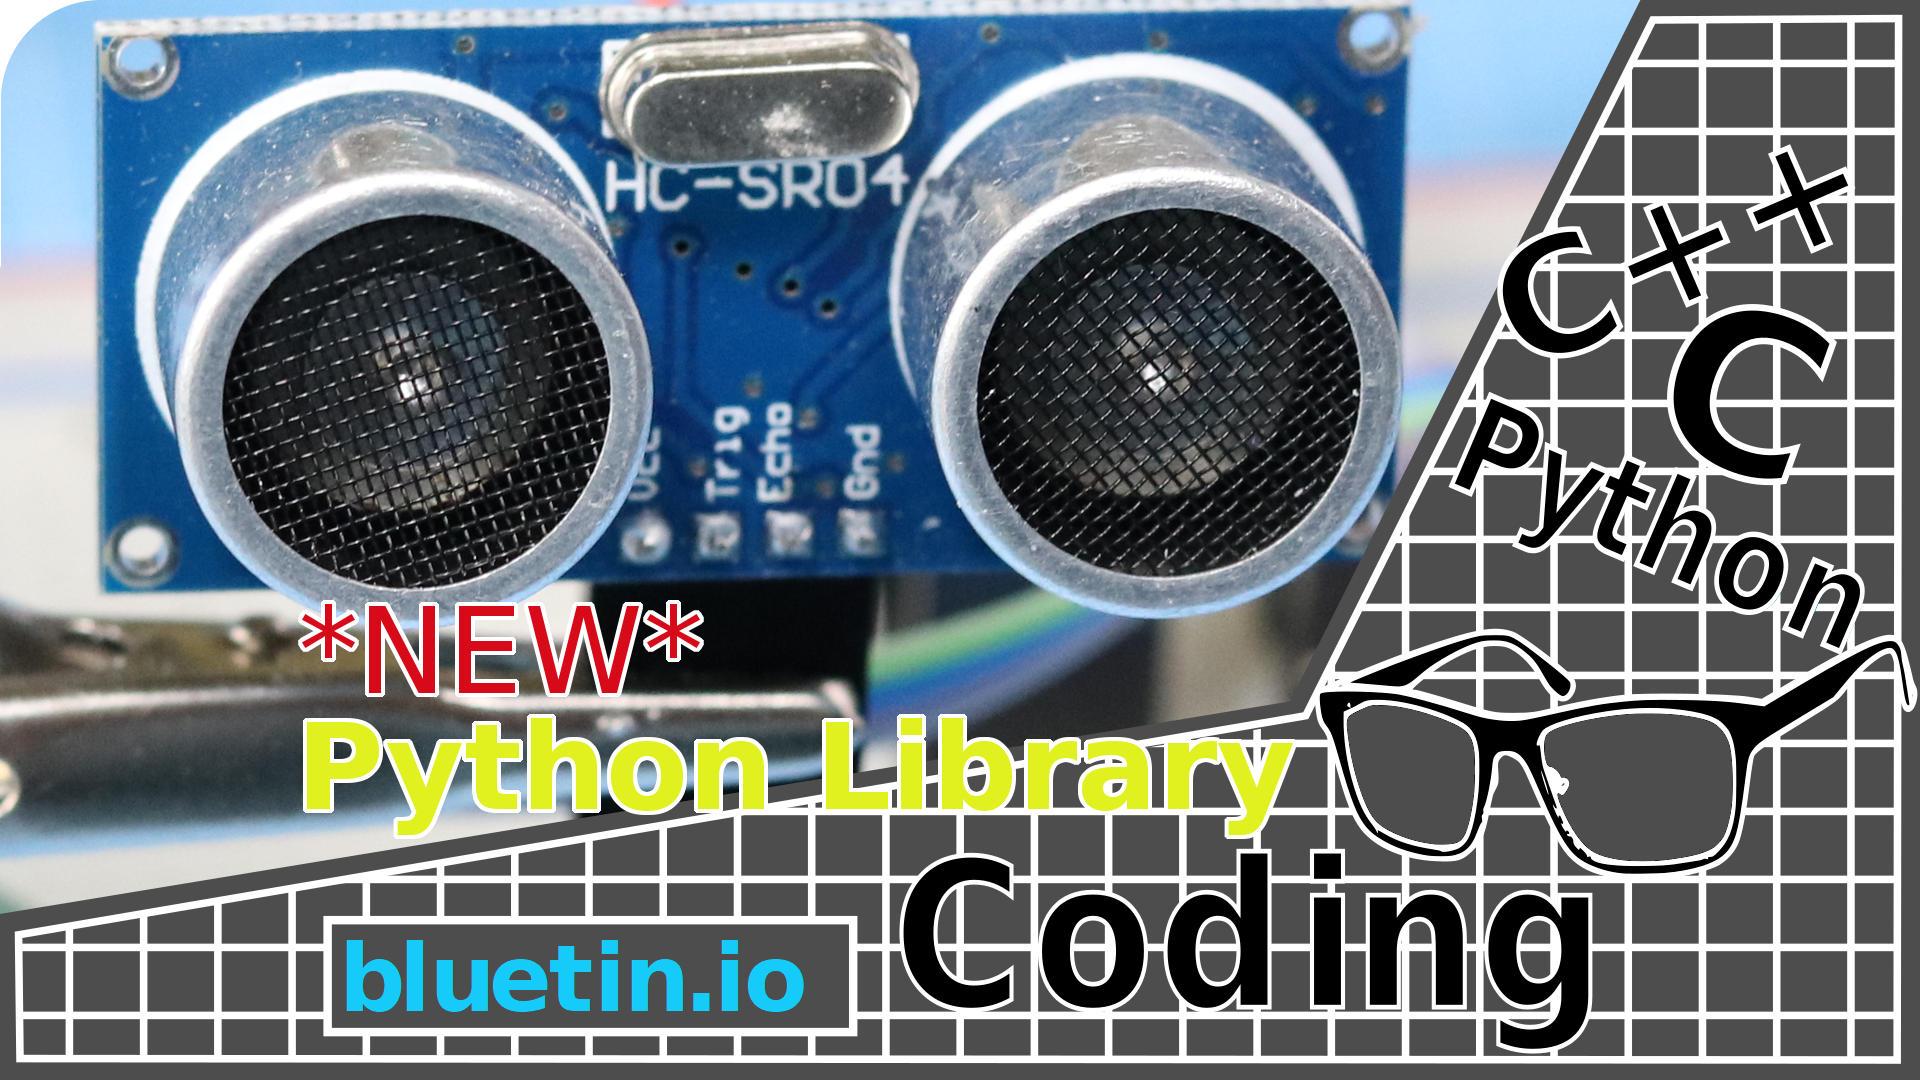 HC-SR04 ultrasonic distance Range Finder per Arduino PIC /& Raspberry Pi UK STOCK